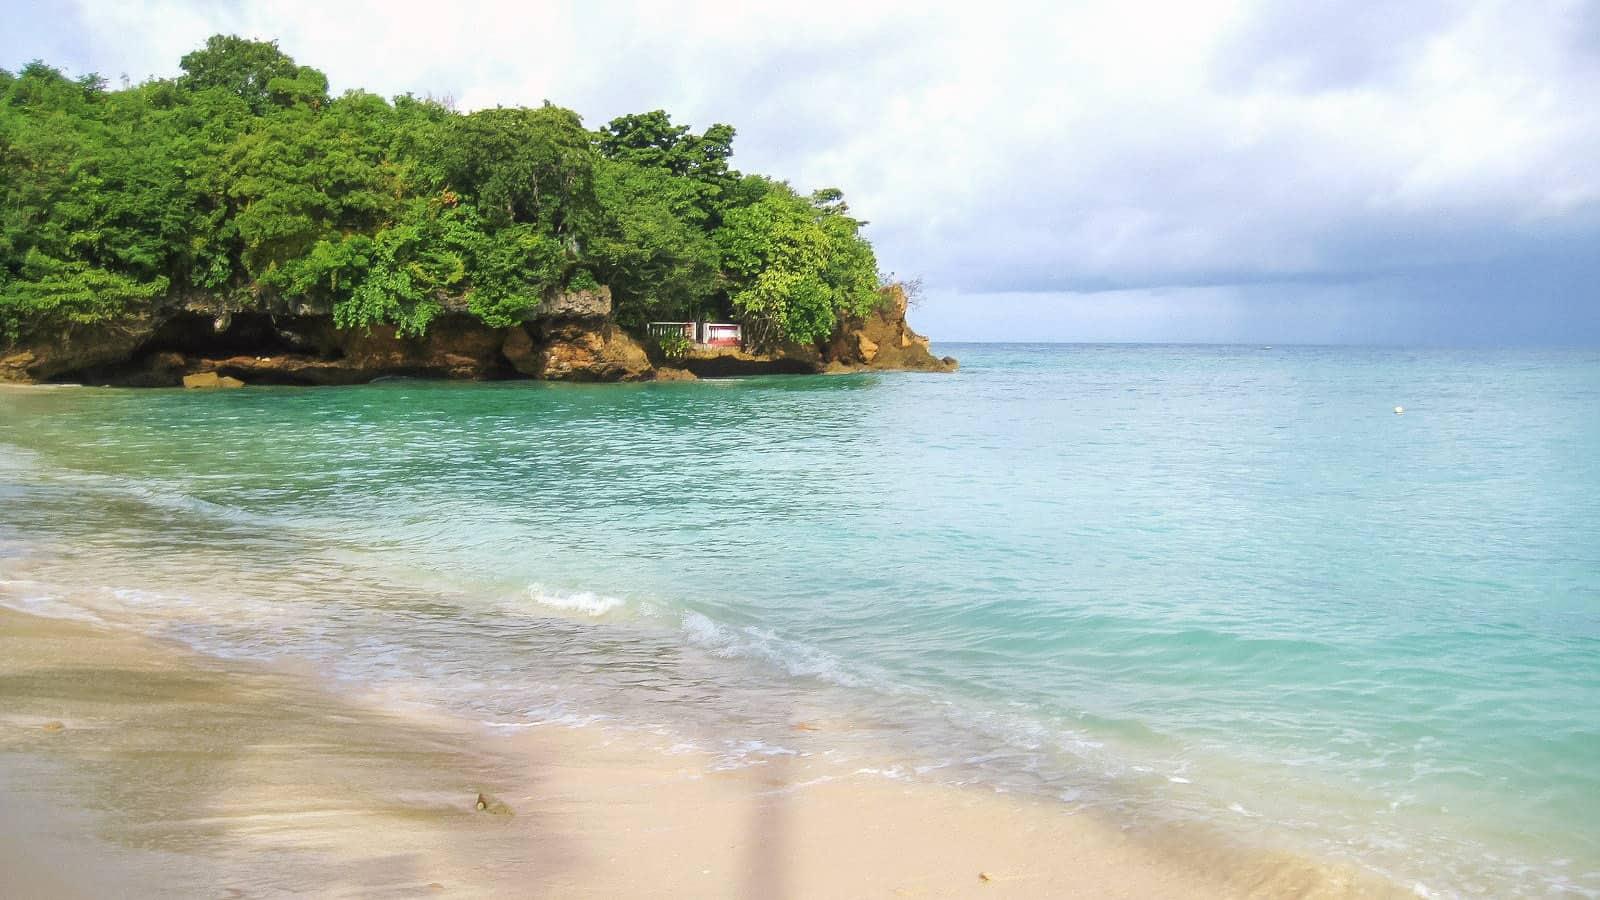 Alubihod Beach: Finding Paradise in Guimaras, Philippines